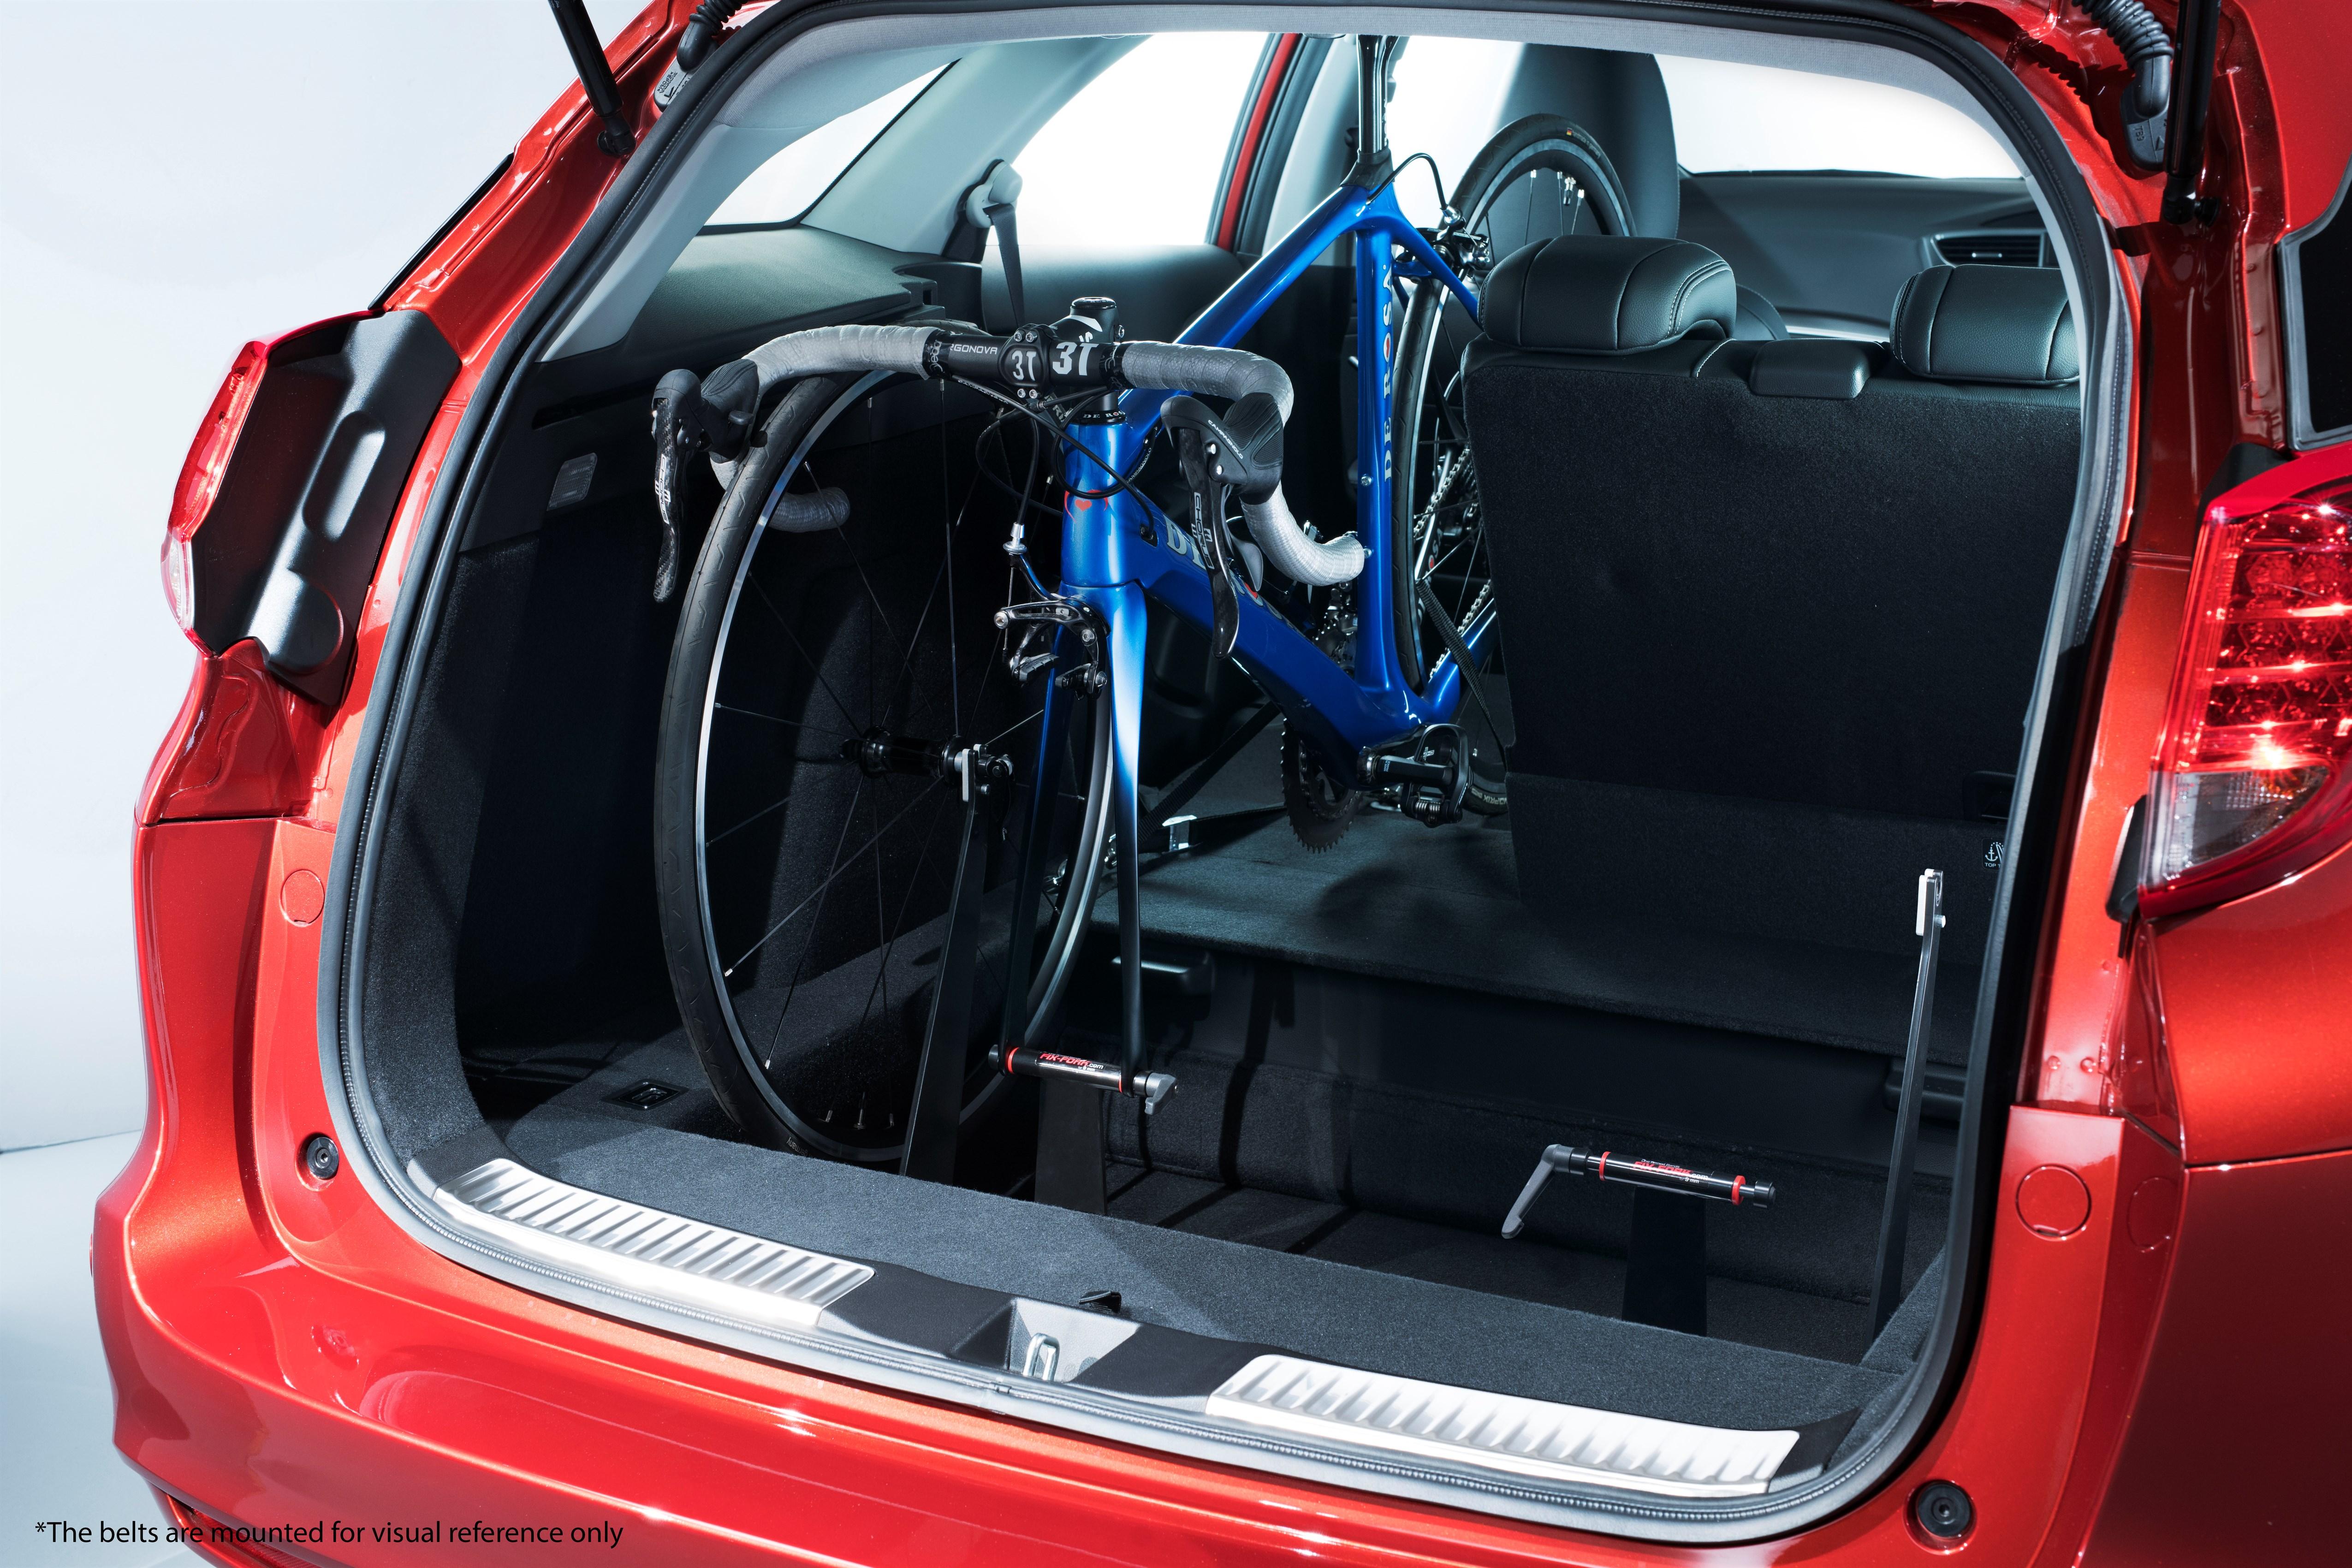 Honda's cool new in-car bike rack for the Civic Tourer